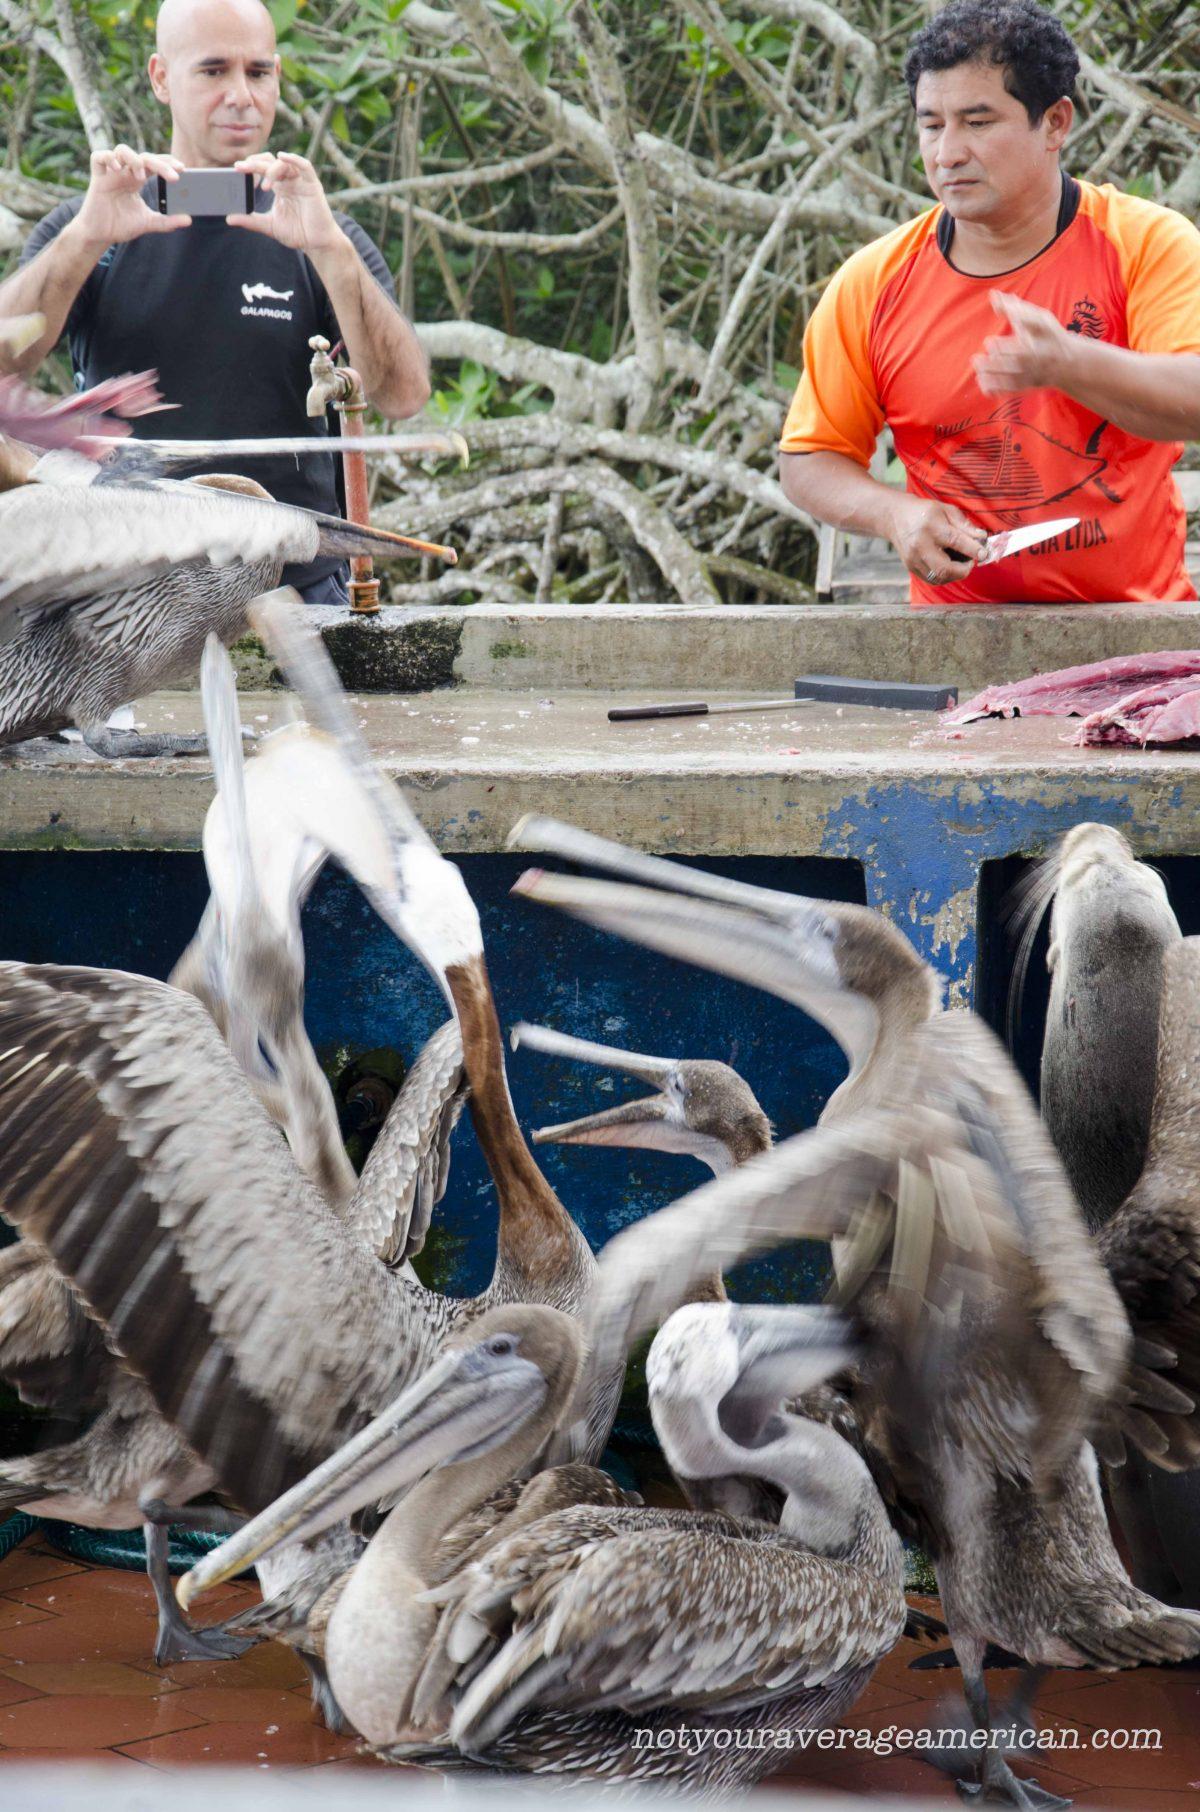 Tourist Snaps Photo of Fish Scrap Chaos | ©Angela Drake